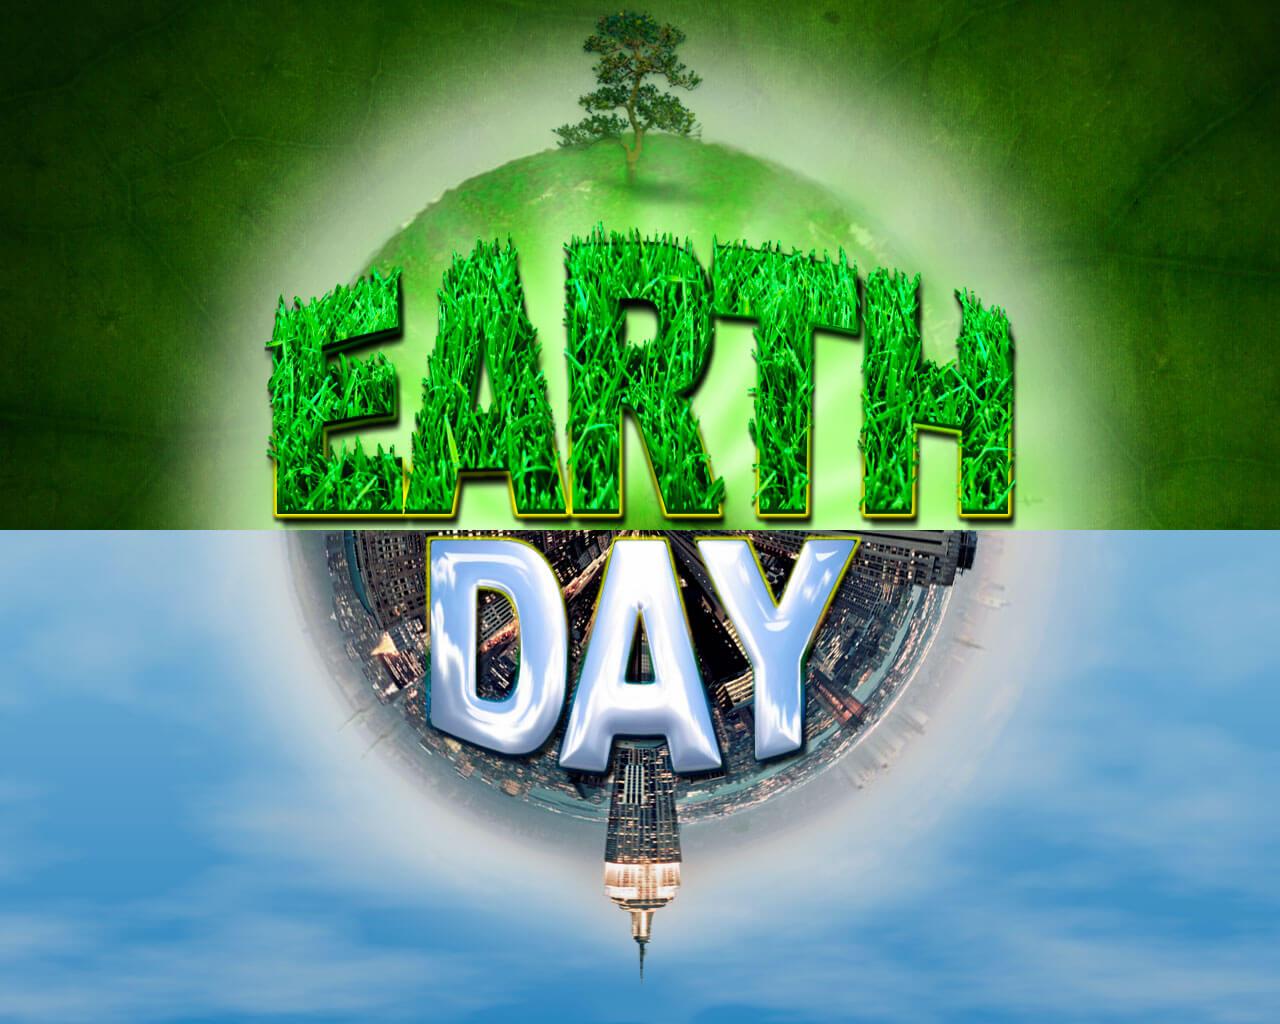 Hd wallpaper environment - Happy Earth Day Go Green Nature Environment Hd Wallpaper